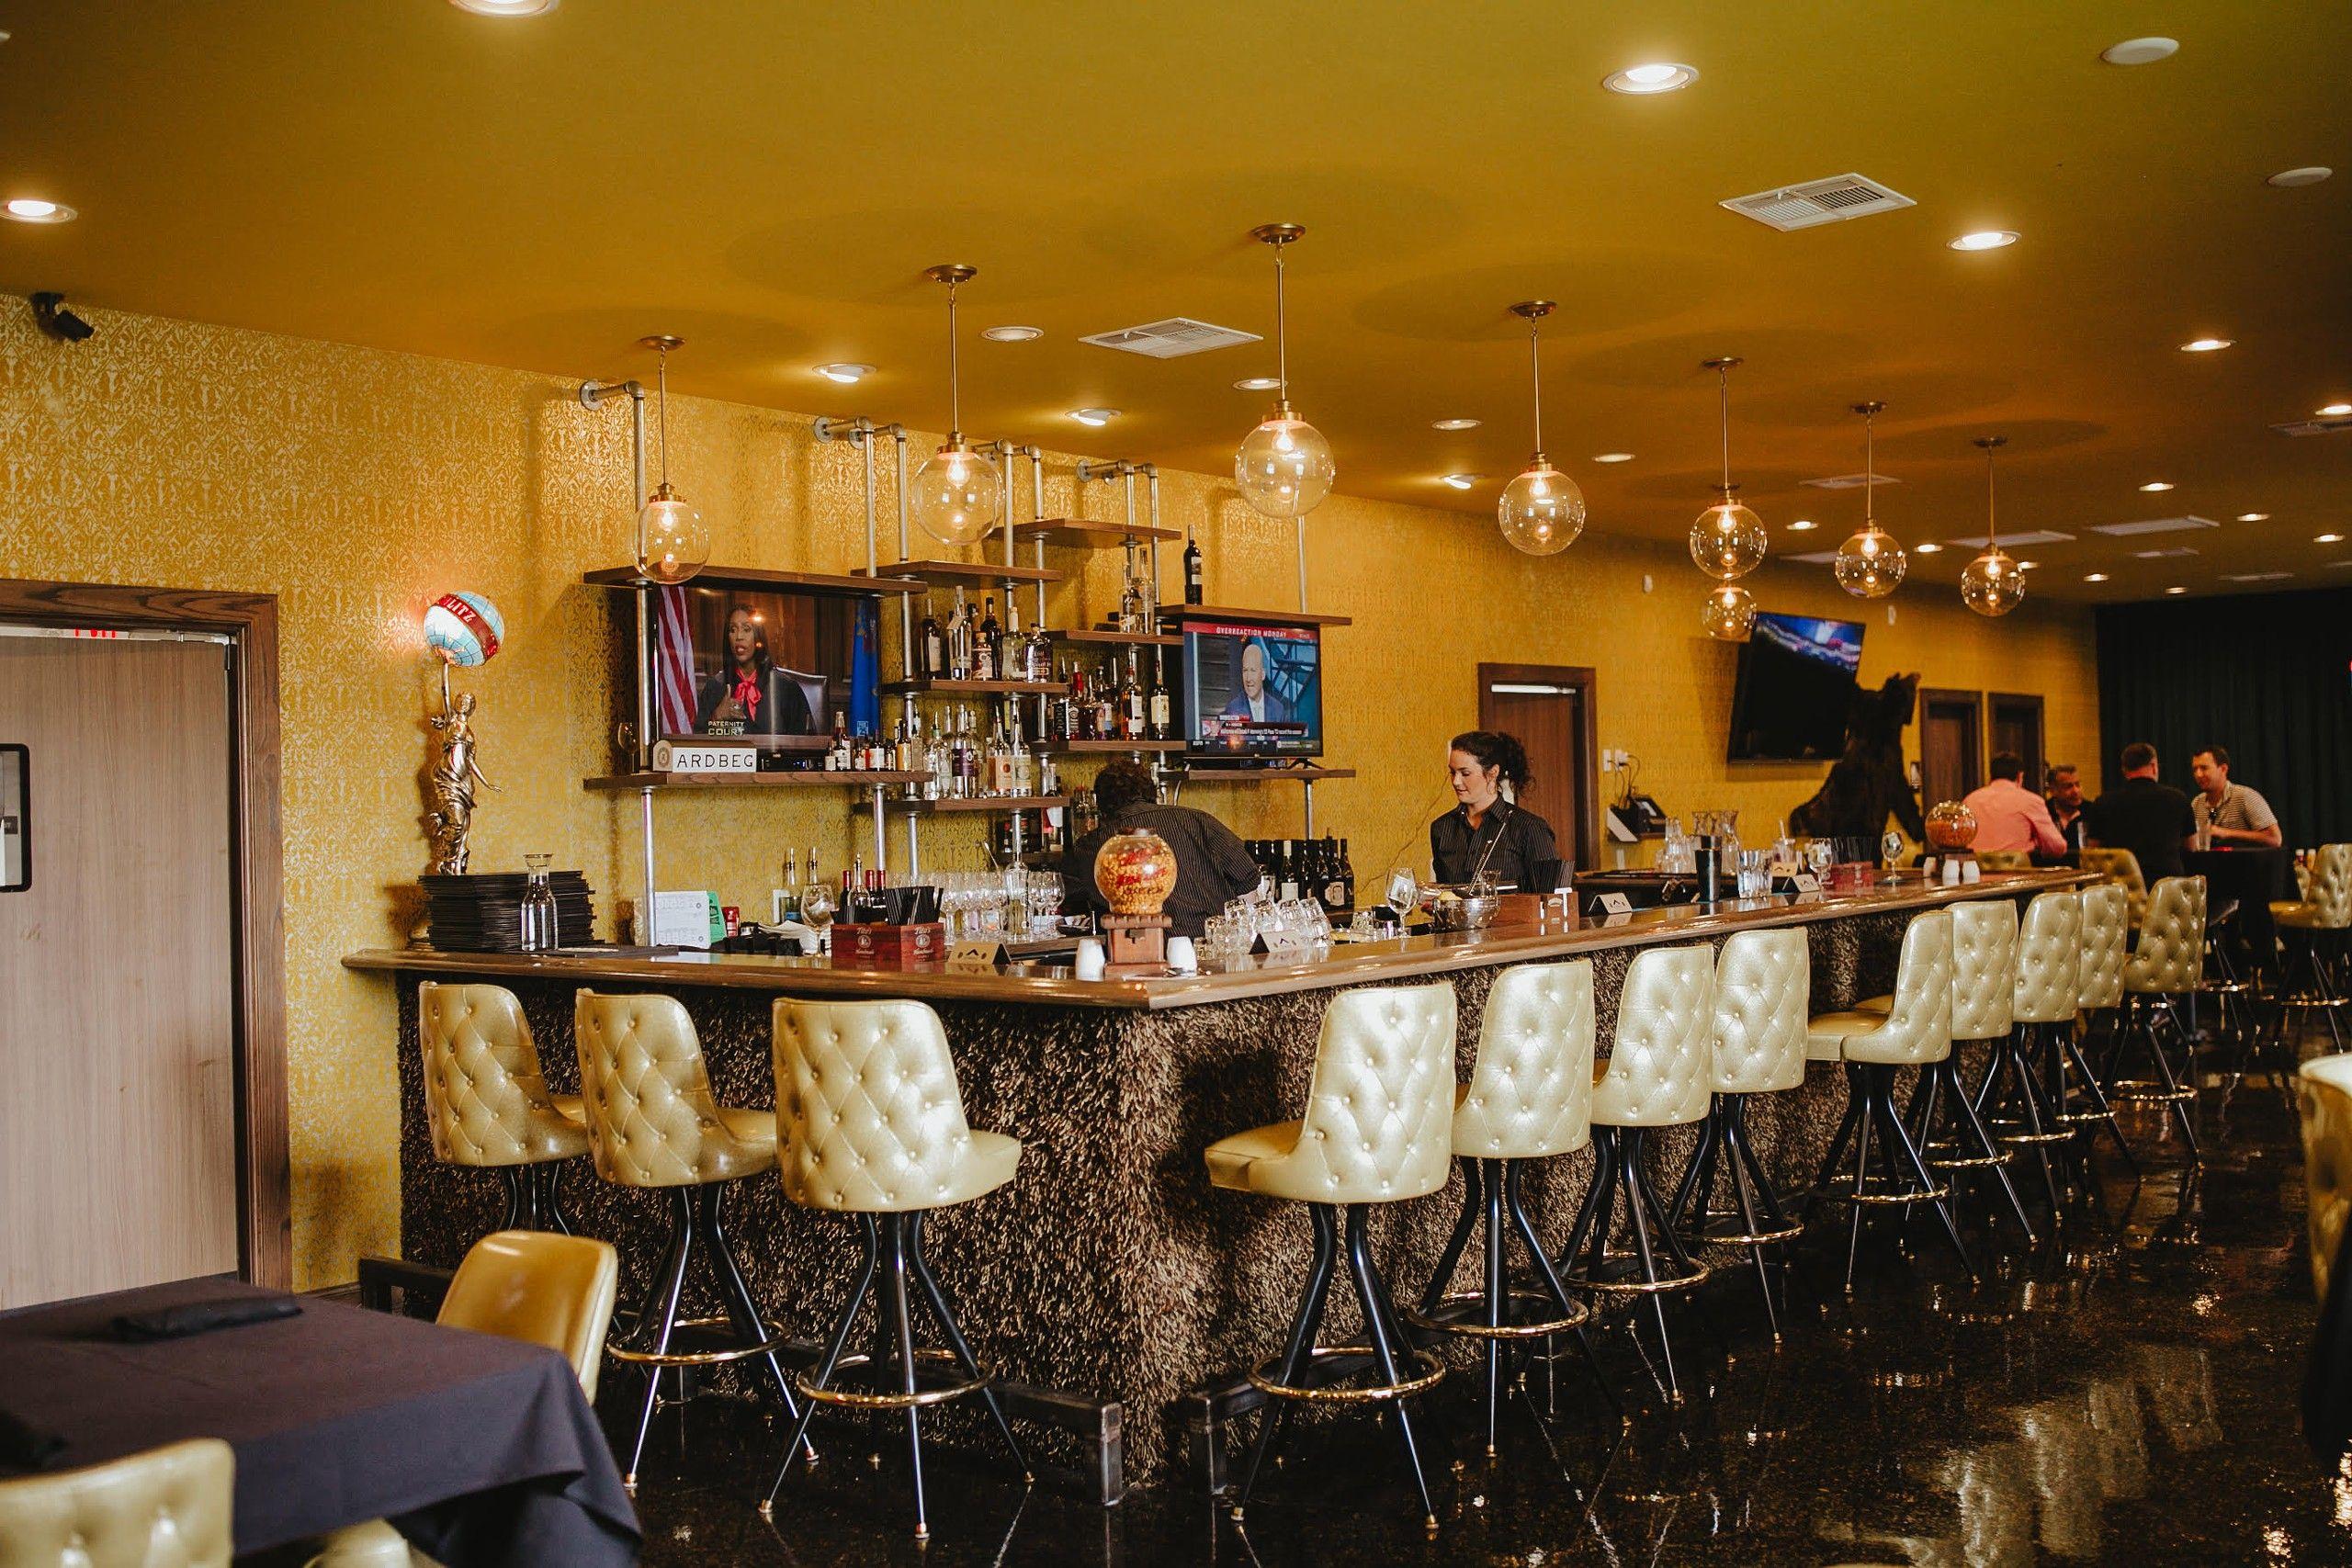 Okg Sneak Peek Ned S Starlite Lounge In Nw Okc Oklahoma City Slideshows Oklahoma Gazette Restaurant Furniture Restaurant Photos Chicago Restaurants